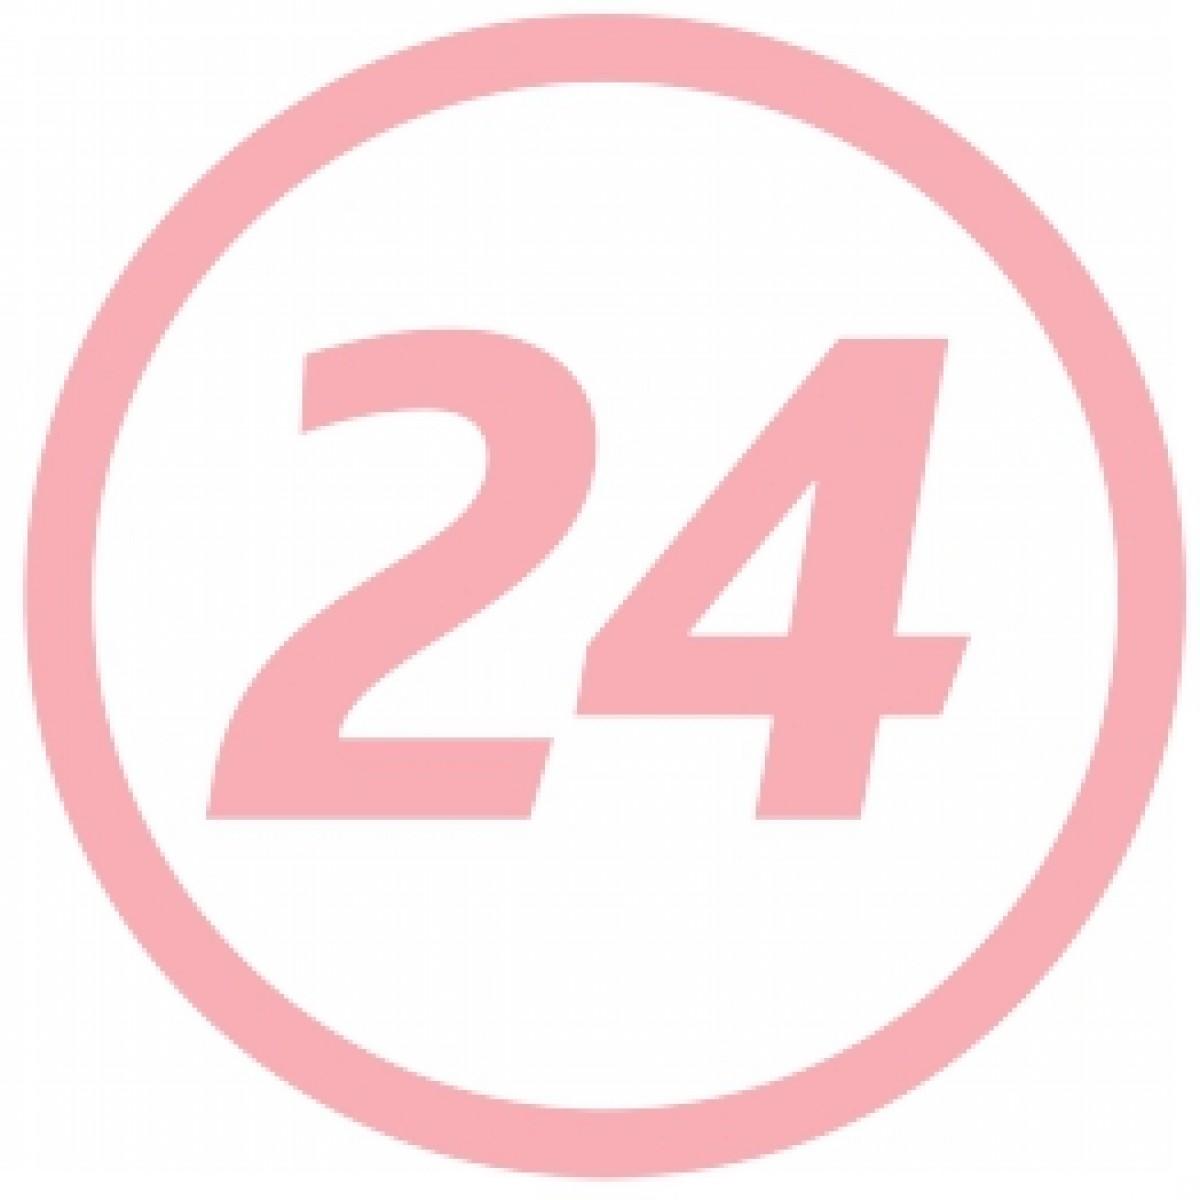 Pachet Ducray A-Derma Exomega Control Crema 400ml 1+50% Reducere la Al Doilea Produs